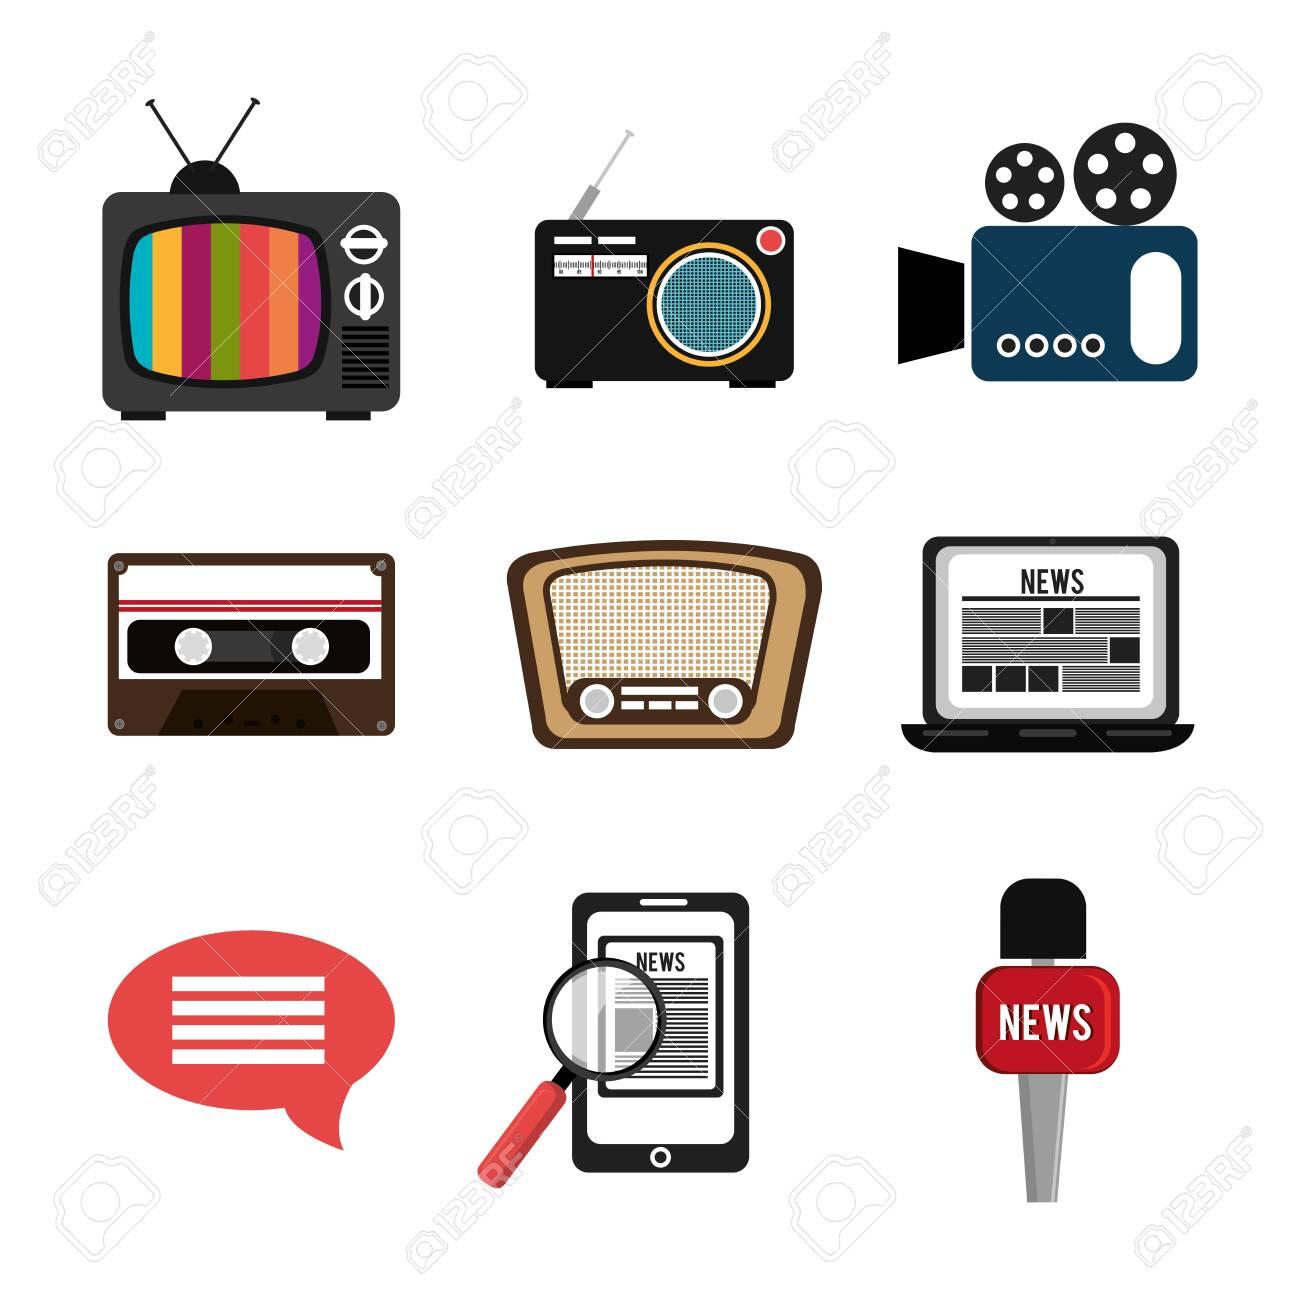 set of news information icons vector illustration design - 142986283